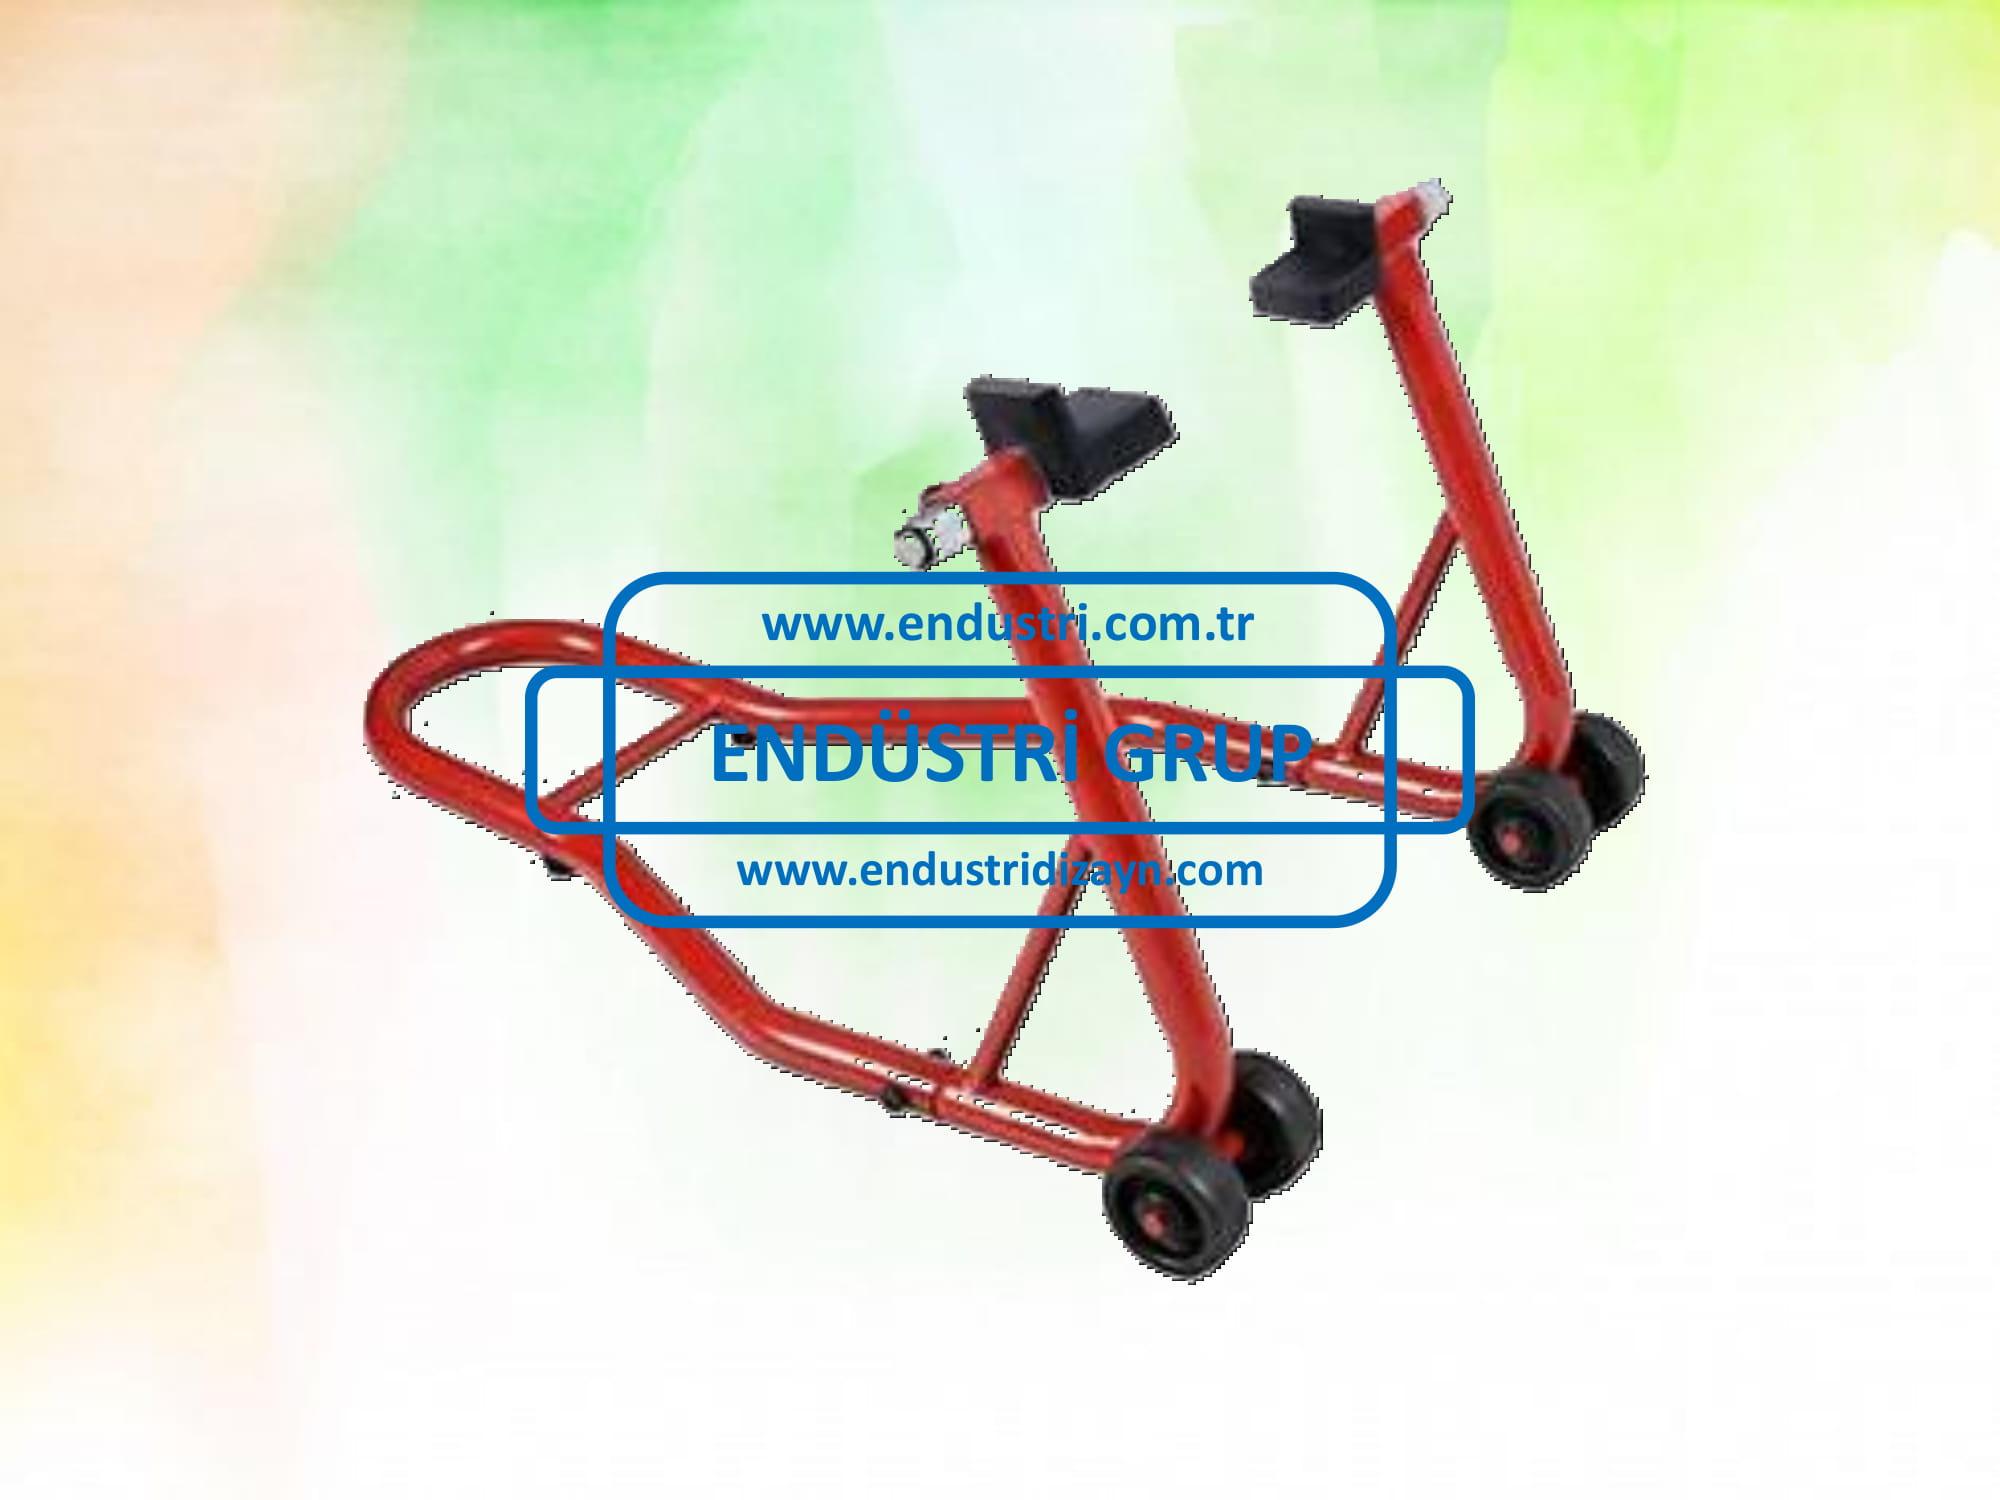 motosiklet-parki-sistemleri-motorlu-bisiklet-motoparking-duragi-modelleri-demiri-aparati